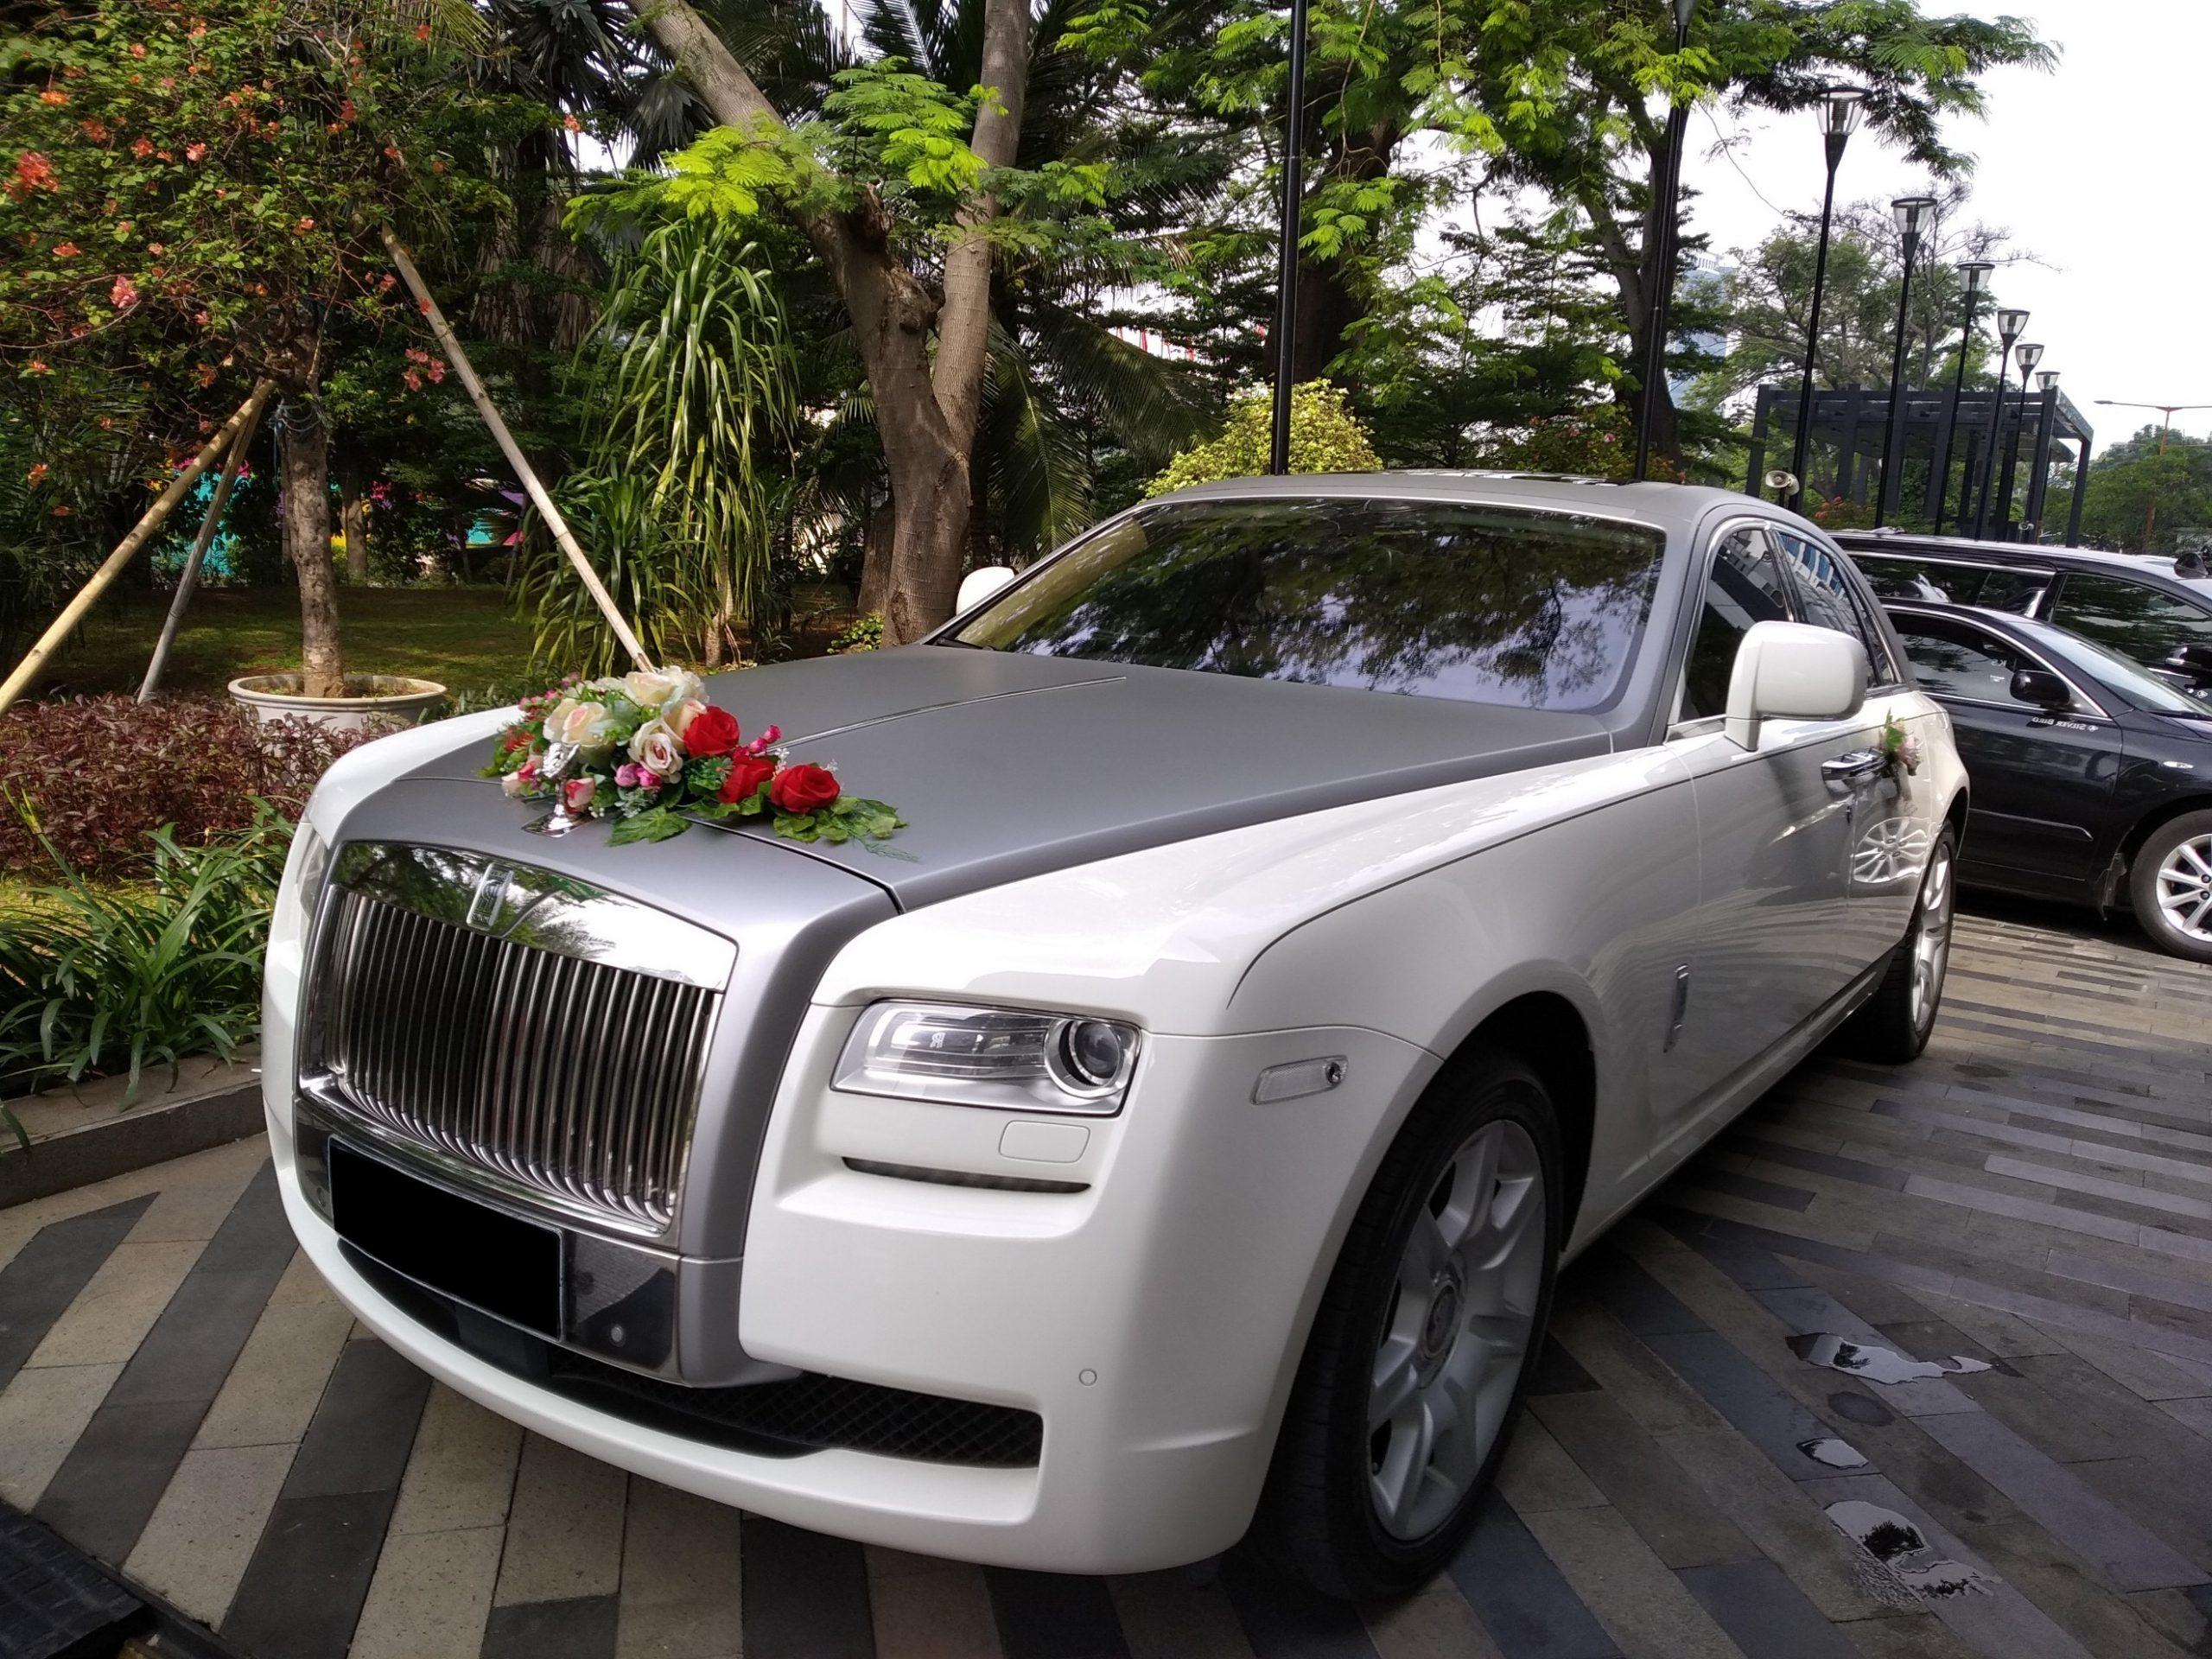 Sewa Rolls Royce Jakarta, Sewa Mobil Mewah, Rental Mobil Pengantin Jakarta, Sewa Wedding Car Jakarta, Sewa Mobil Pengantin Bogor, Sewa Mobil Pengantin, Bekasi, Sewa Mobil Pengantin Tangerang, Sewa Mobil Pengantin Karawang, Sewa Mobil Pengantin Bandung